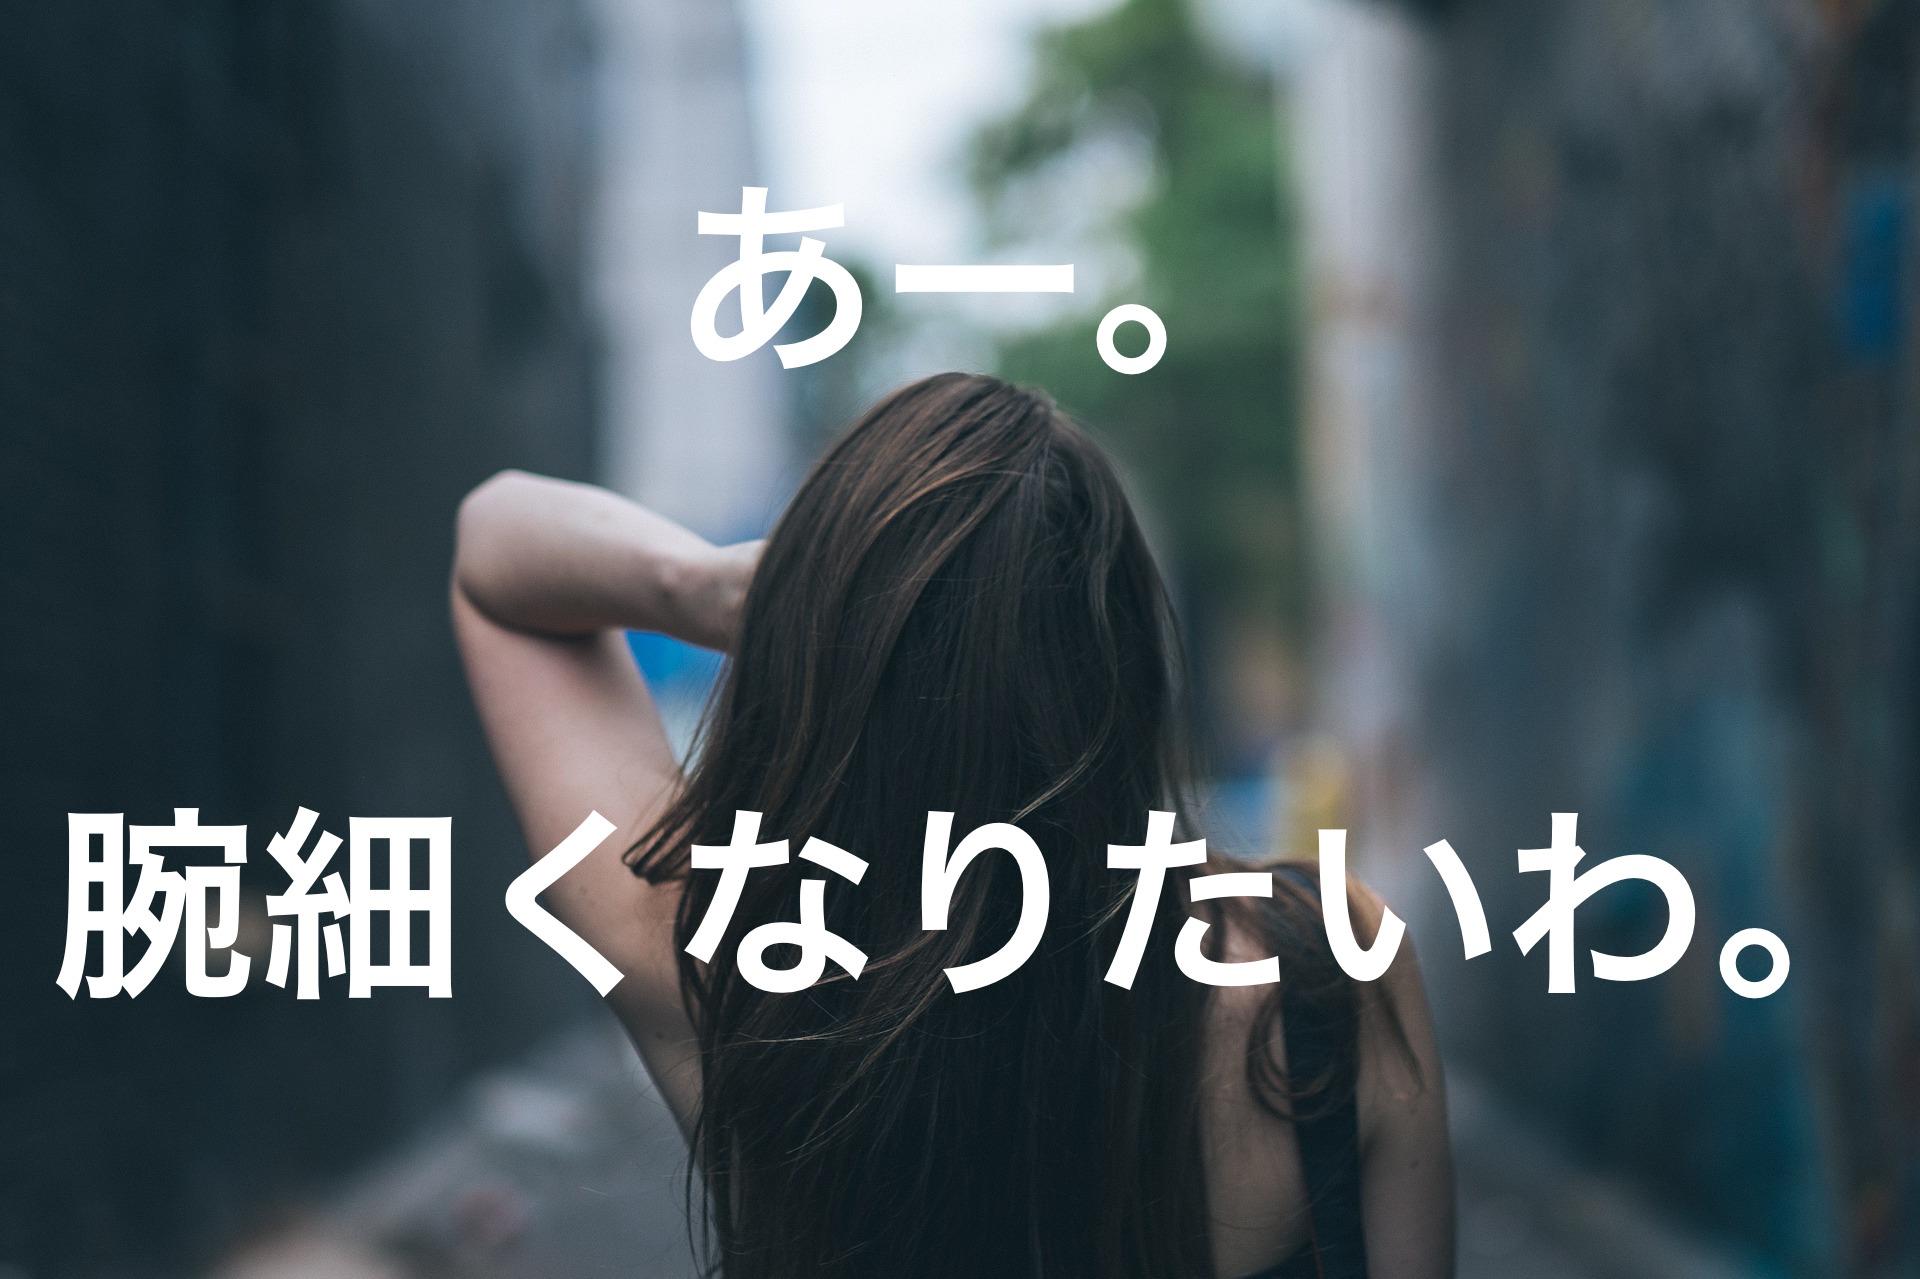 hair-863698_1920